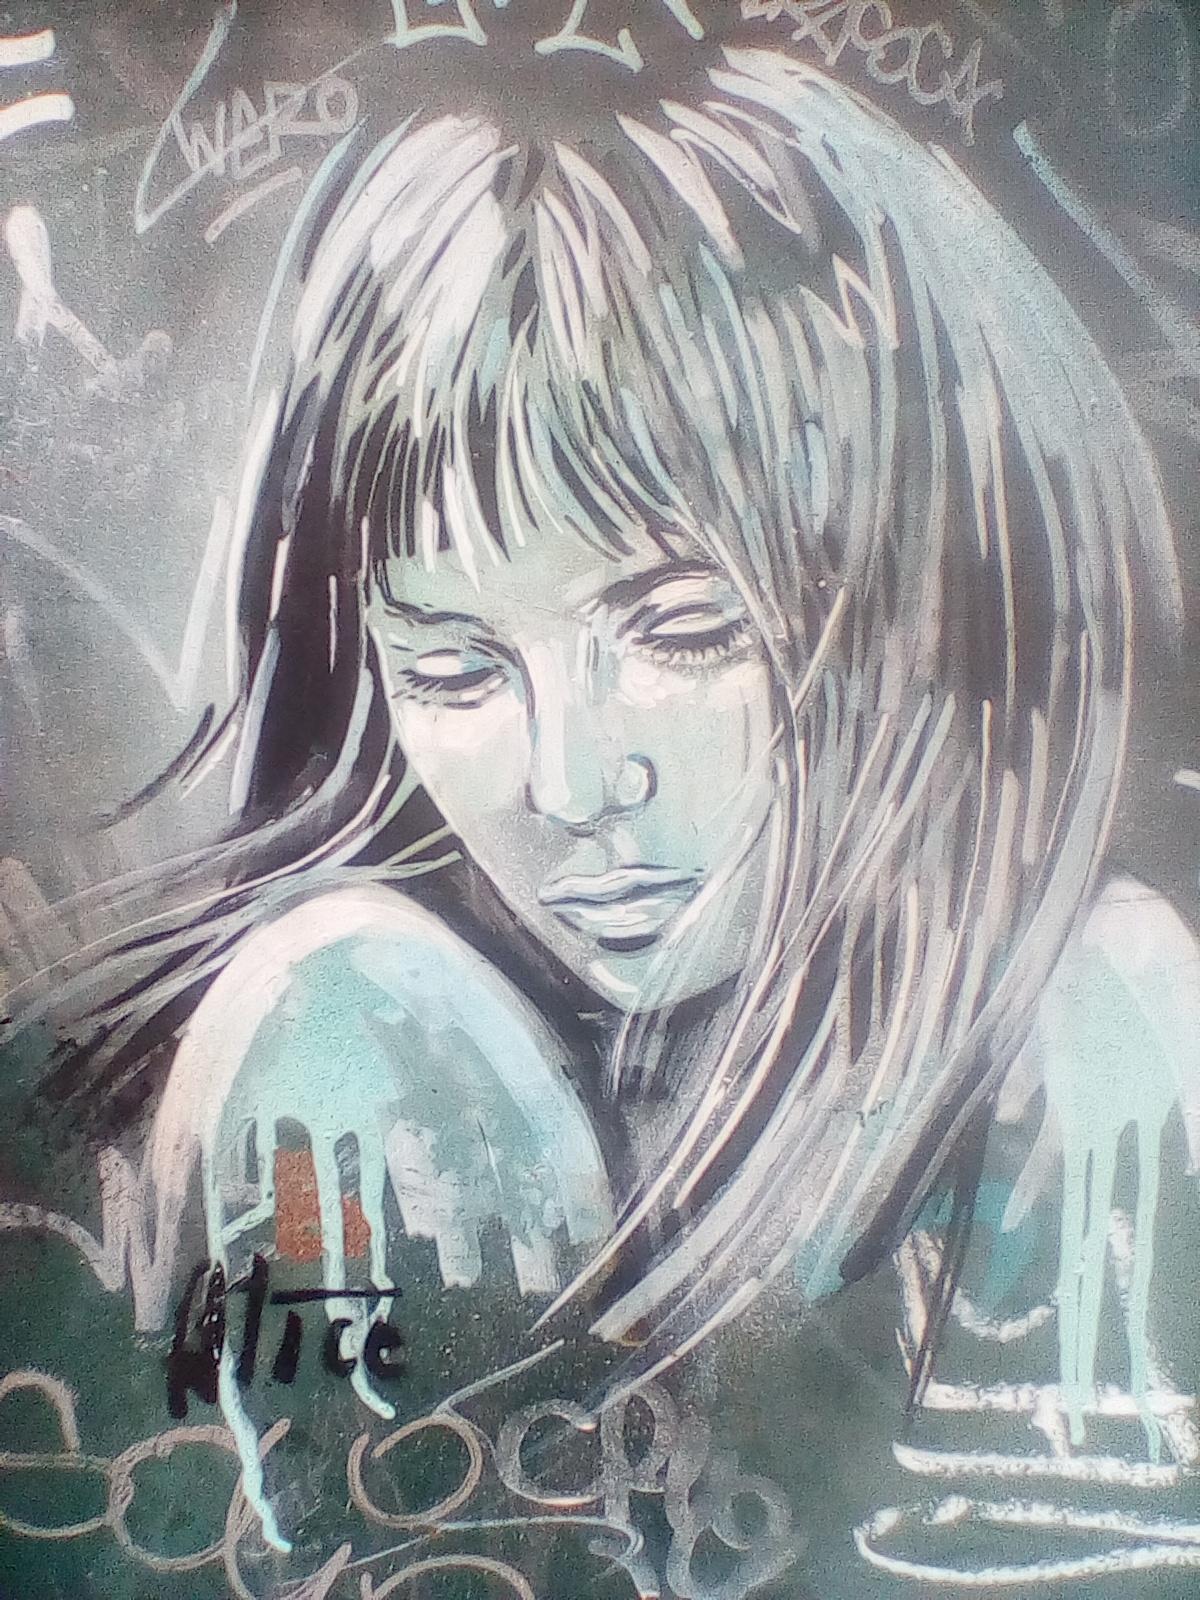 Www. Grafitintrastevere.blogspot.com